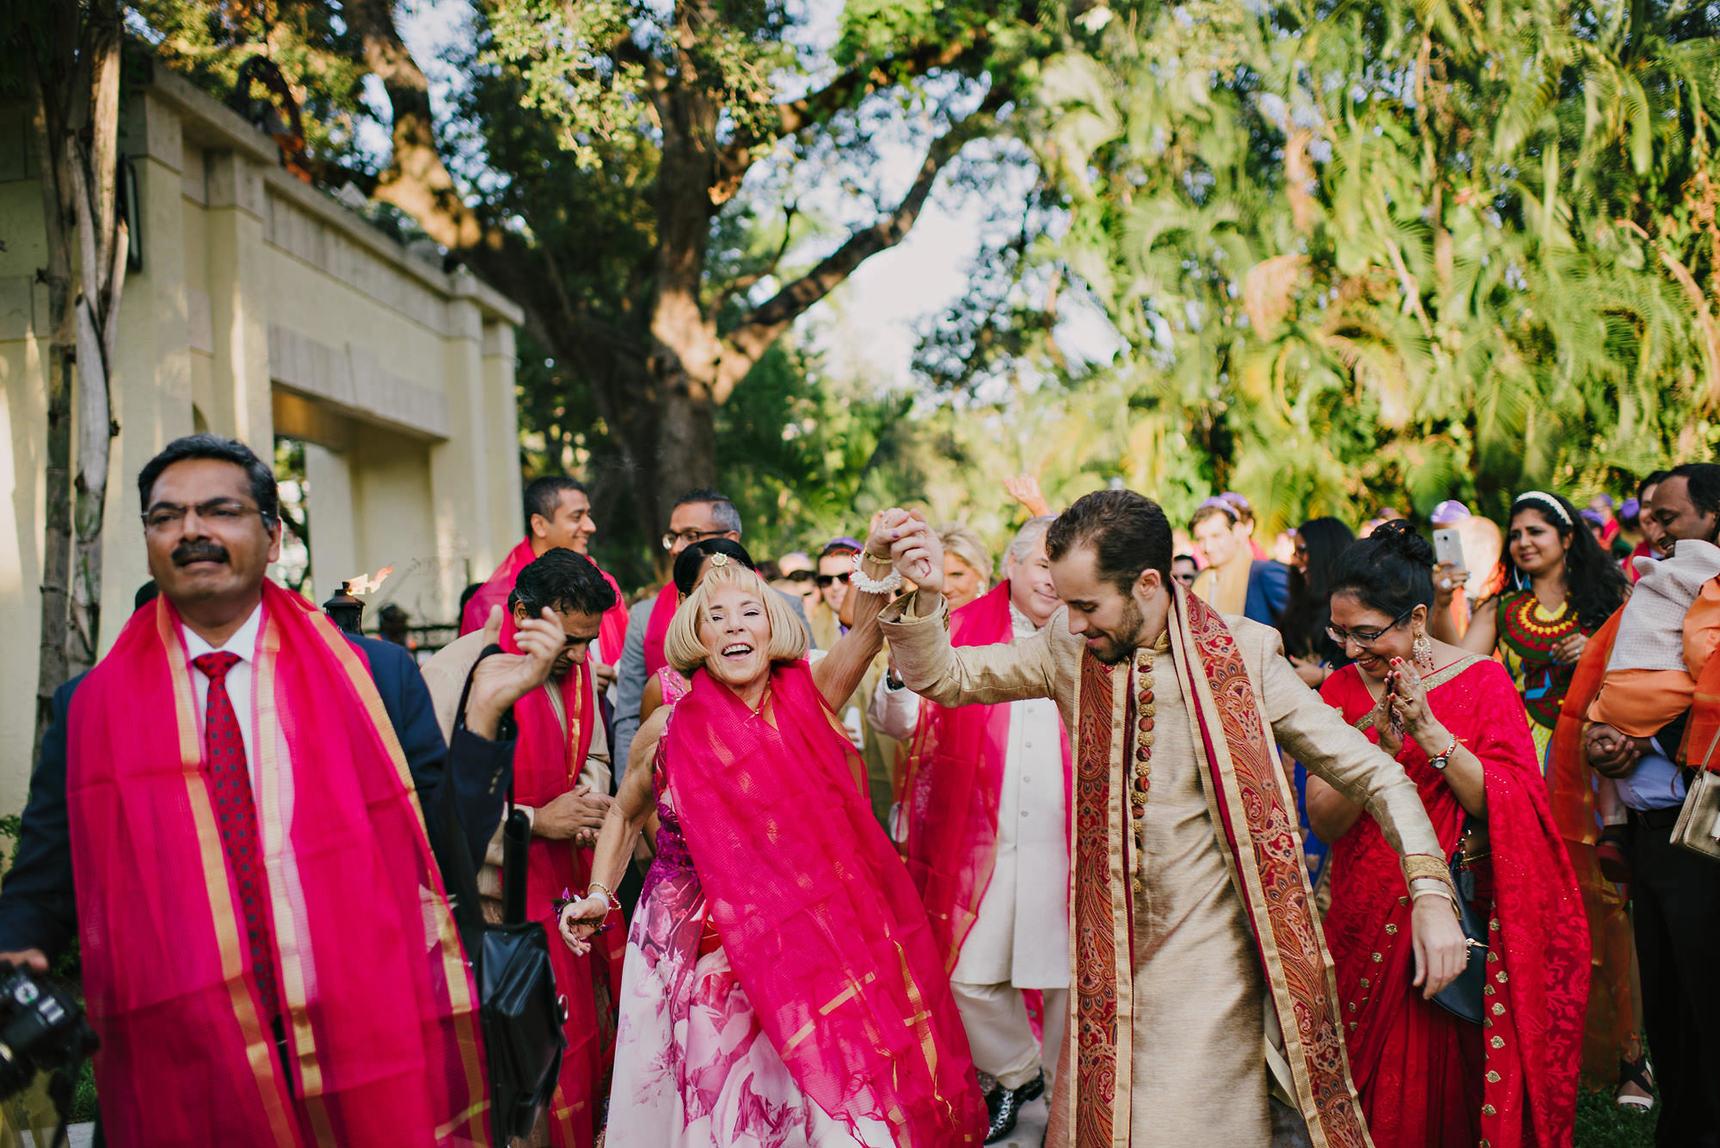 miami-luxury-catering-Wedding-Photography-49(pp_w1720_h1148).jpg